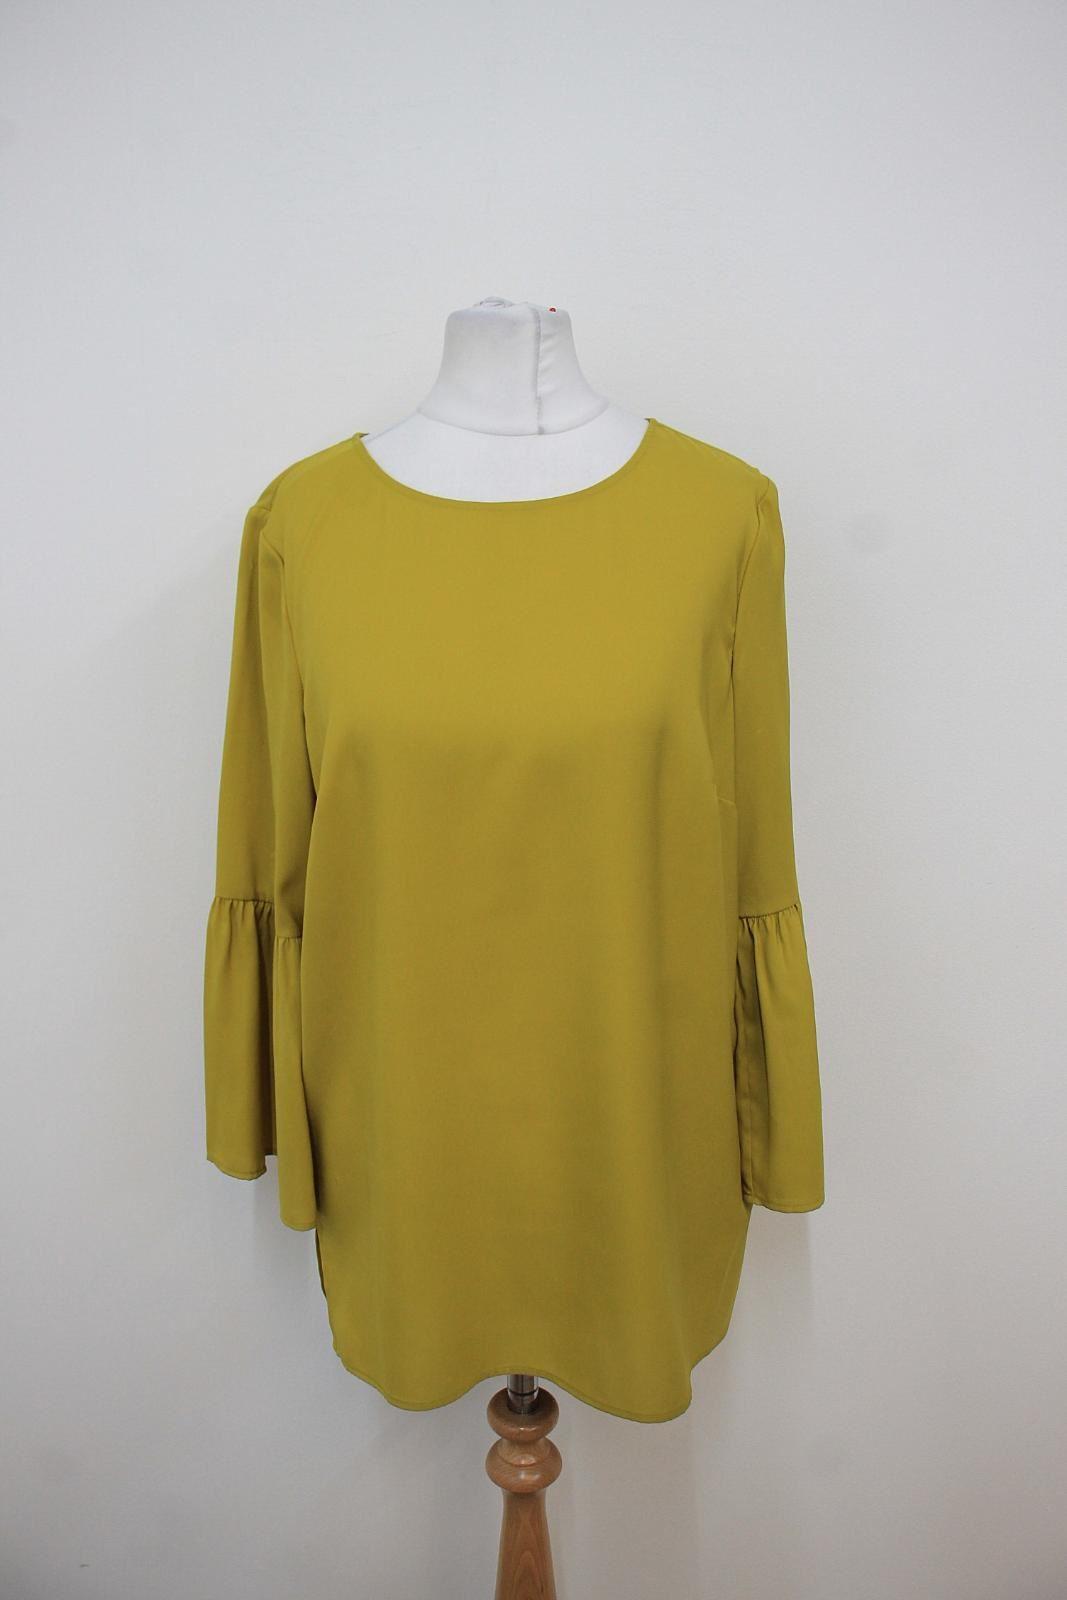 HOBBS-Ladies-Mimosa-Green-Frilled-3-4-Sleeved-Louisa-Blouse-Size-UK8-NEW